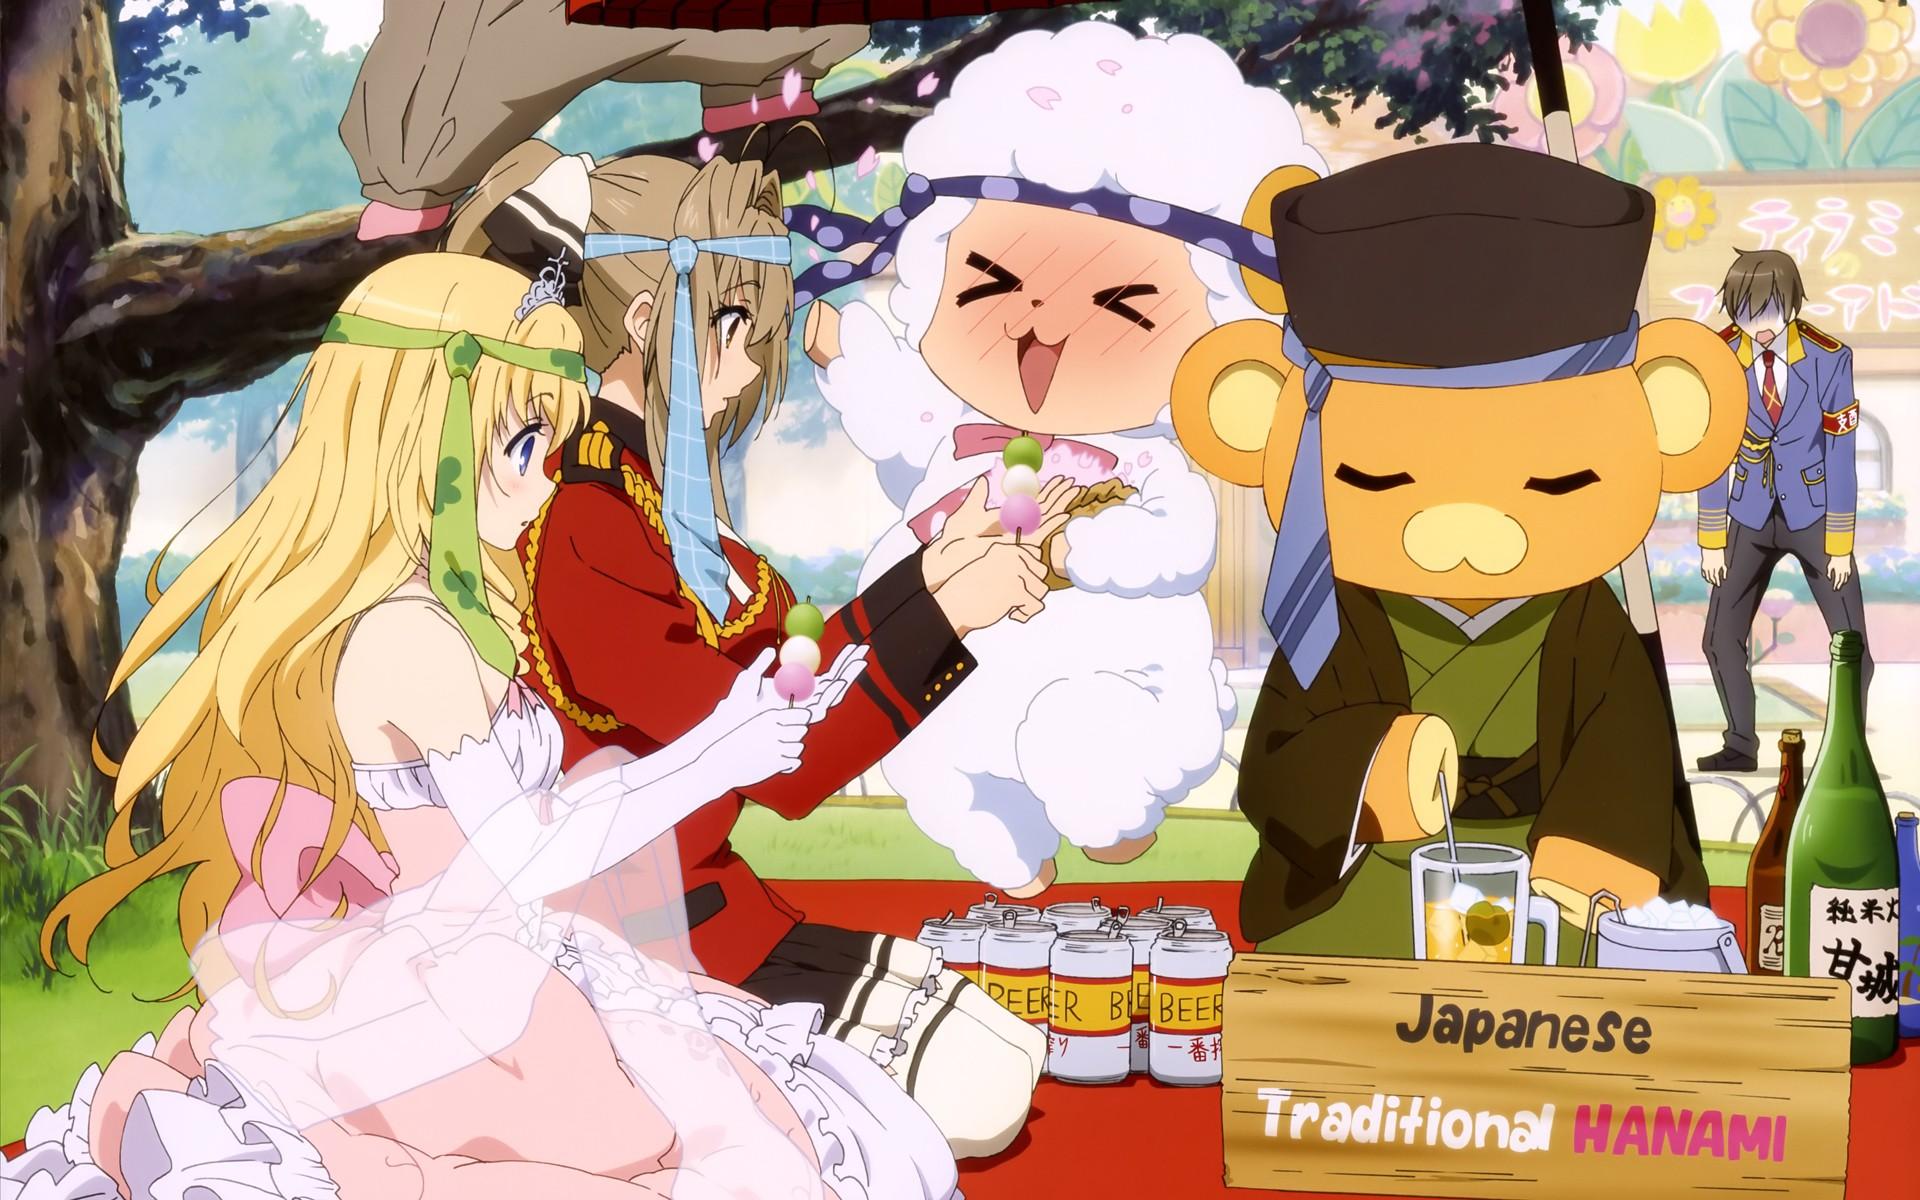 Anime 1920x1200 Amagi Brilliant Park Sento Isuzu Kanie Seiya Fleuranza Latifa Moffle (Amagi Brilliant Park) Macaron (Amagi Brilliant Park)